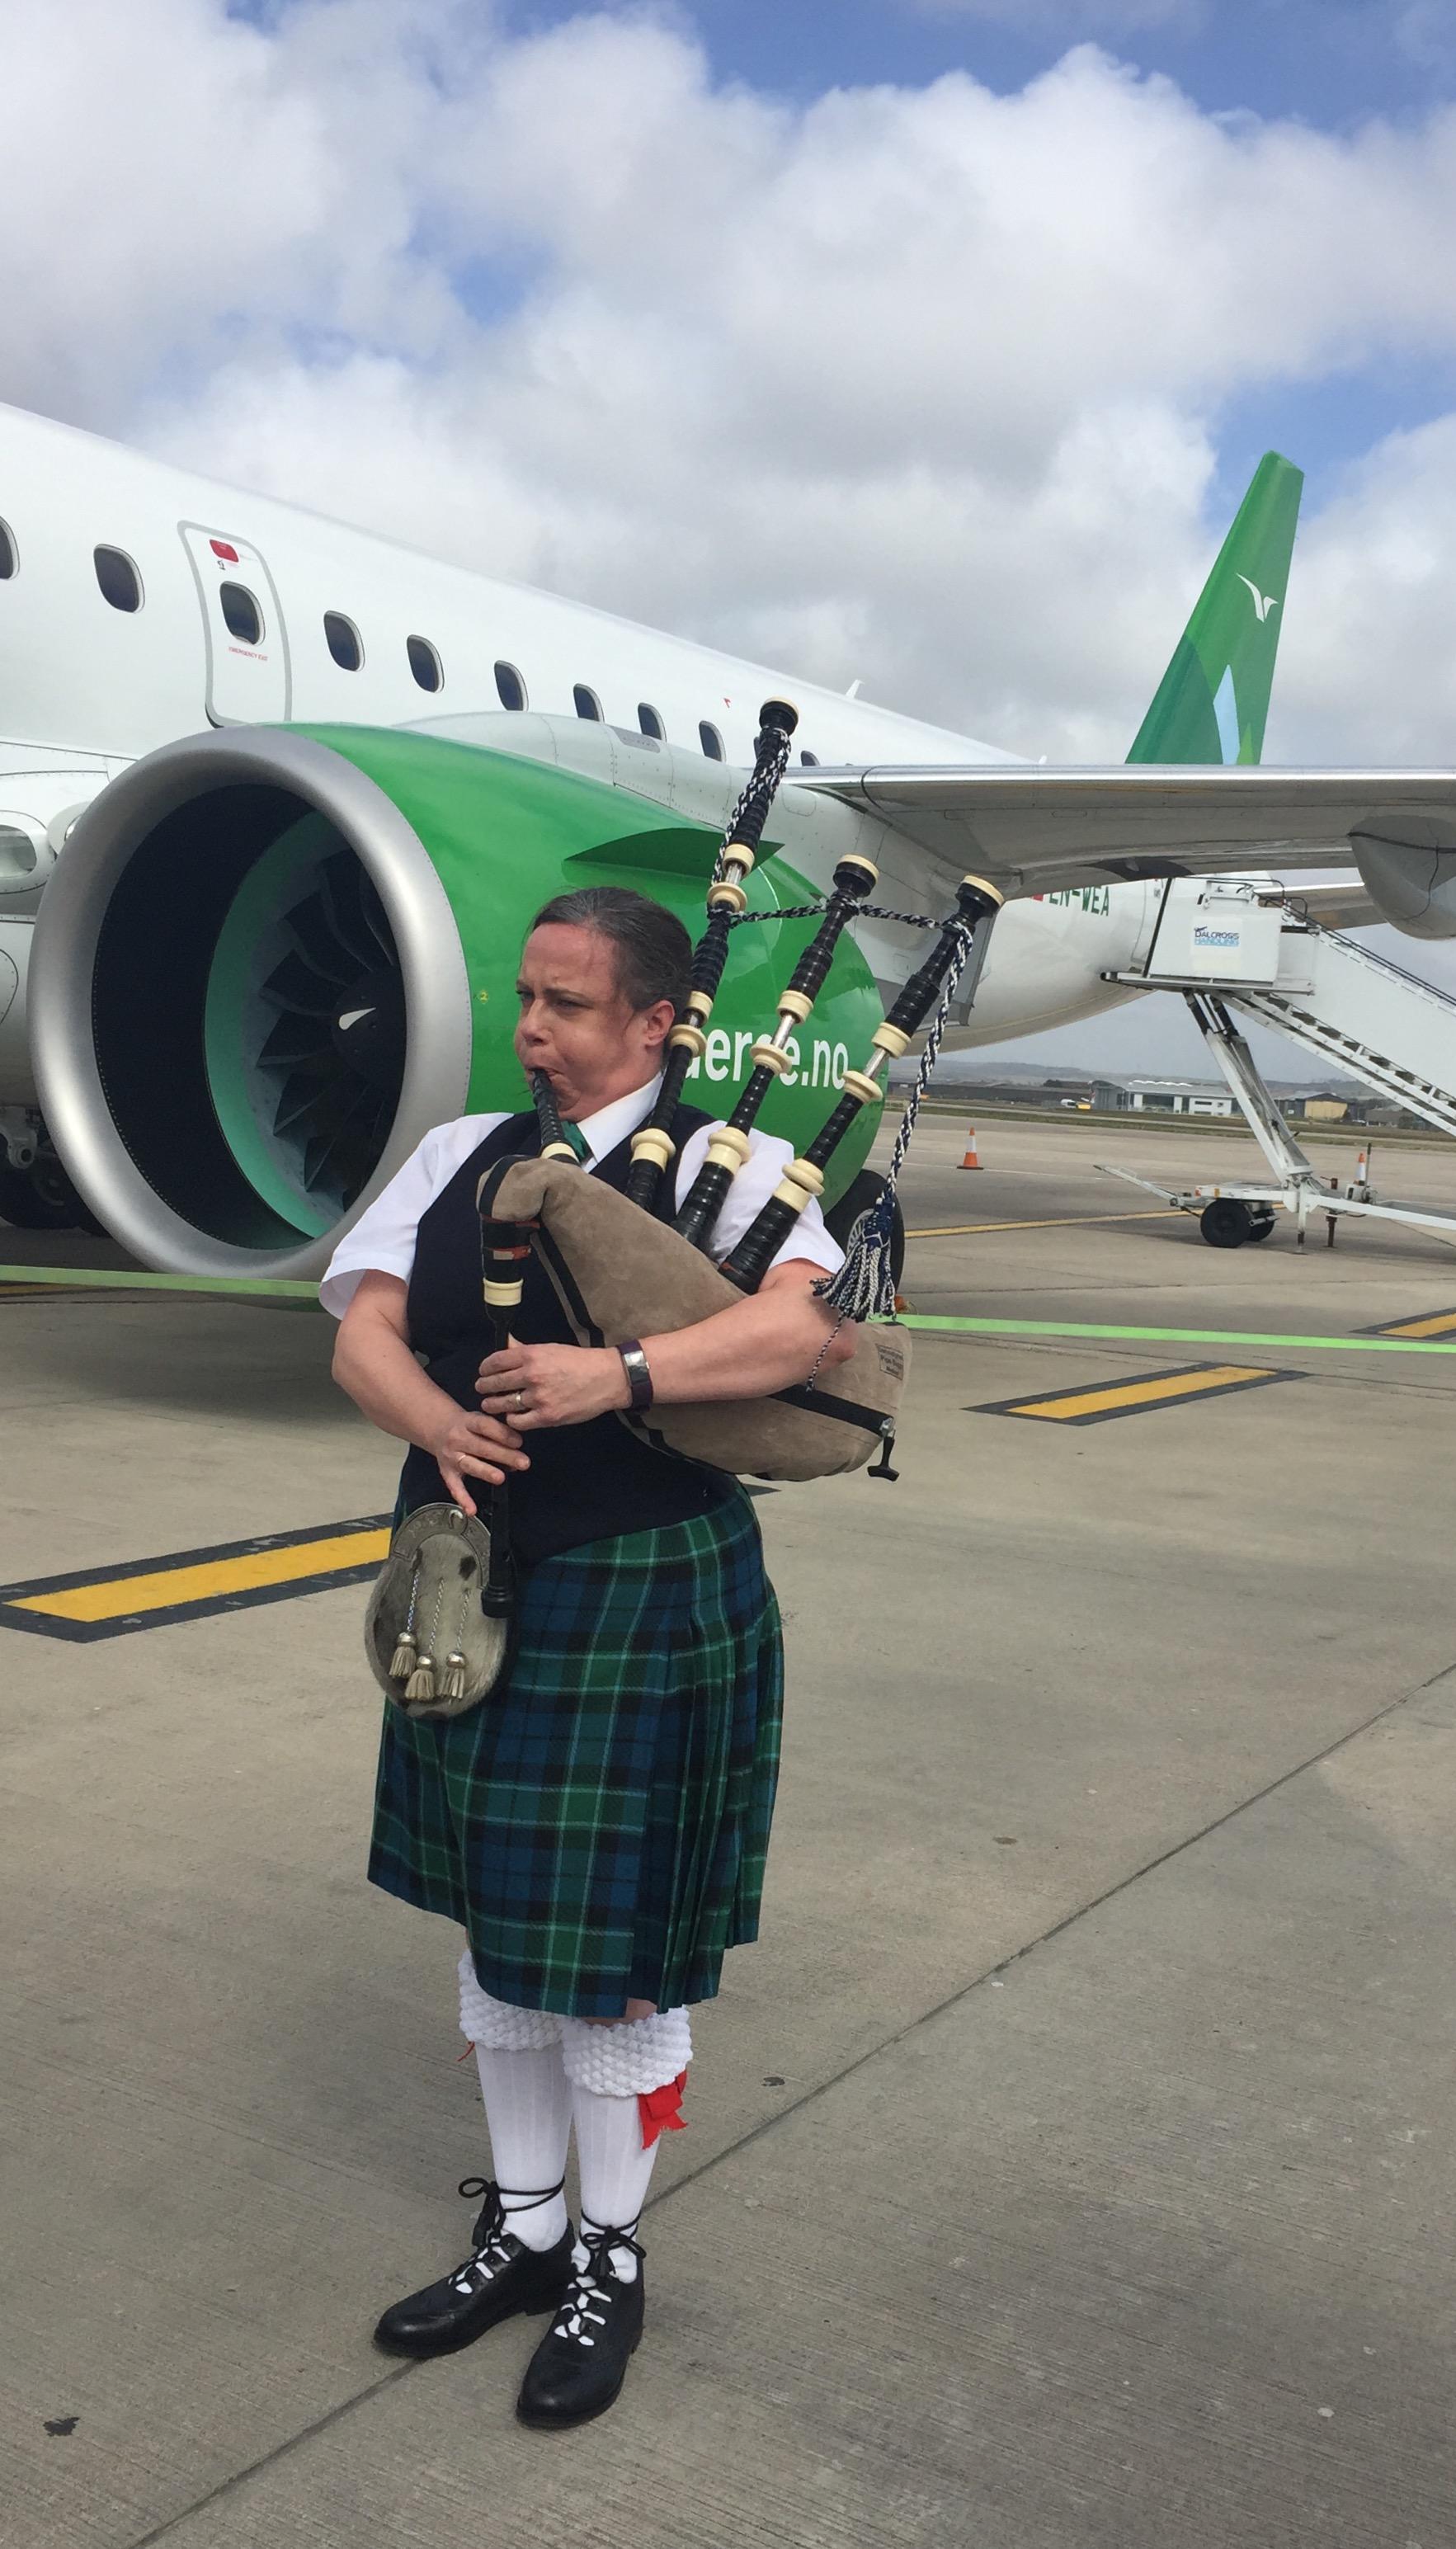 We were sent off Scottish-style!